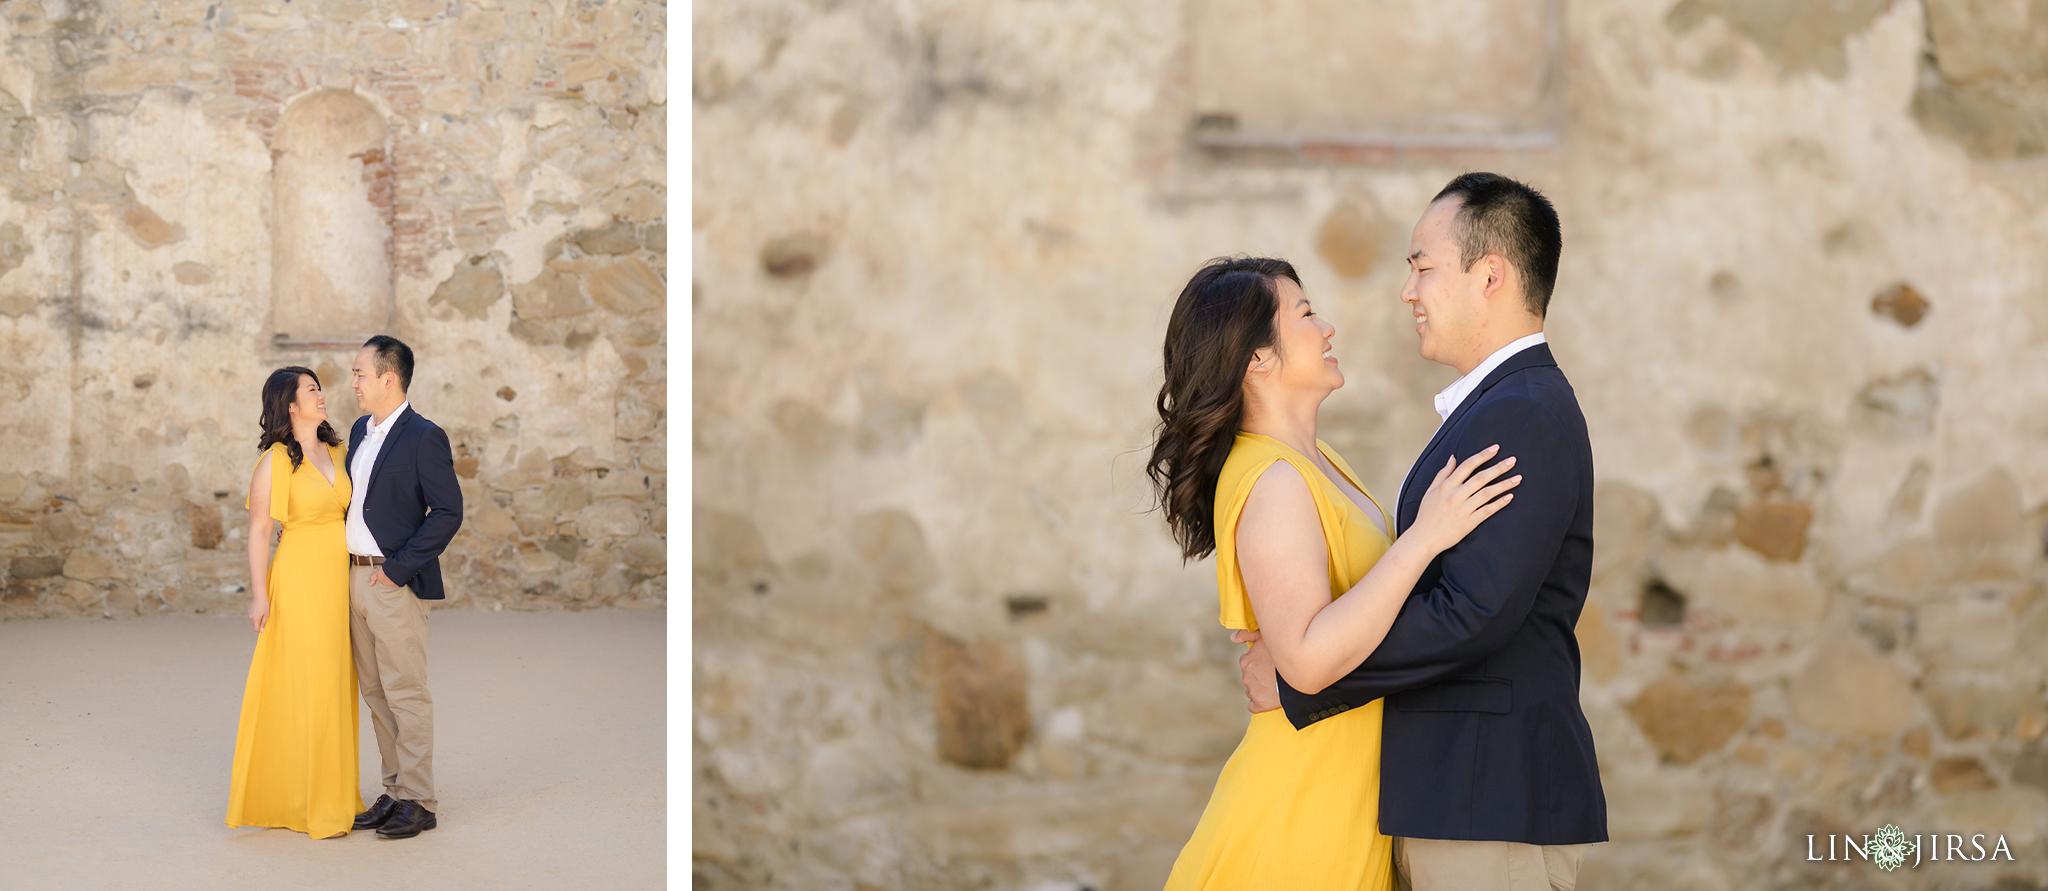 znc Mission San Juan Capistrano Engagement Photography